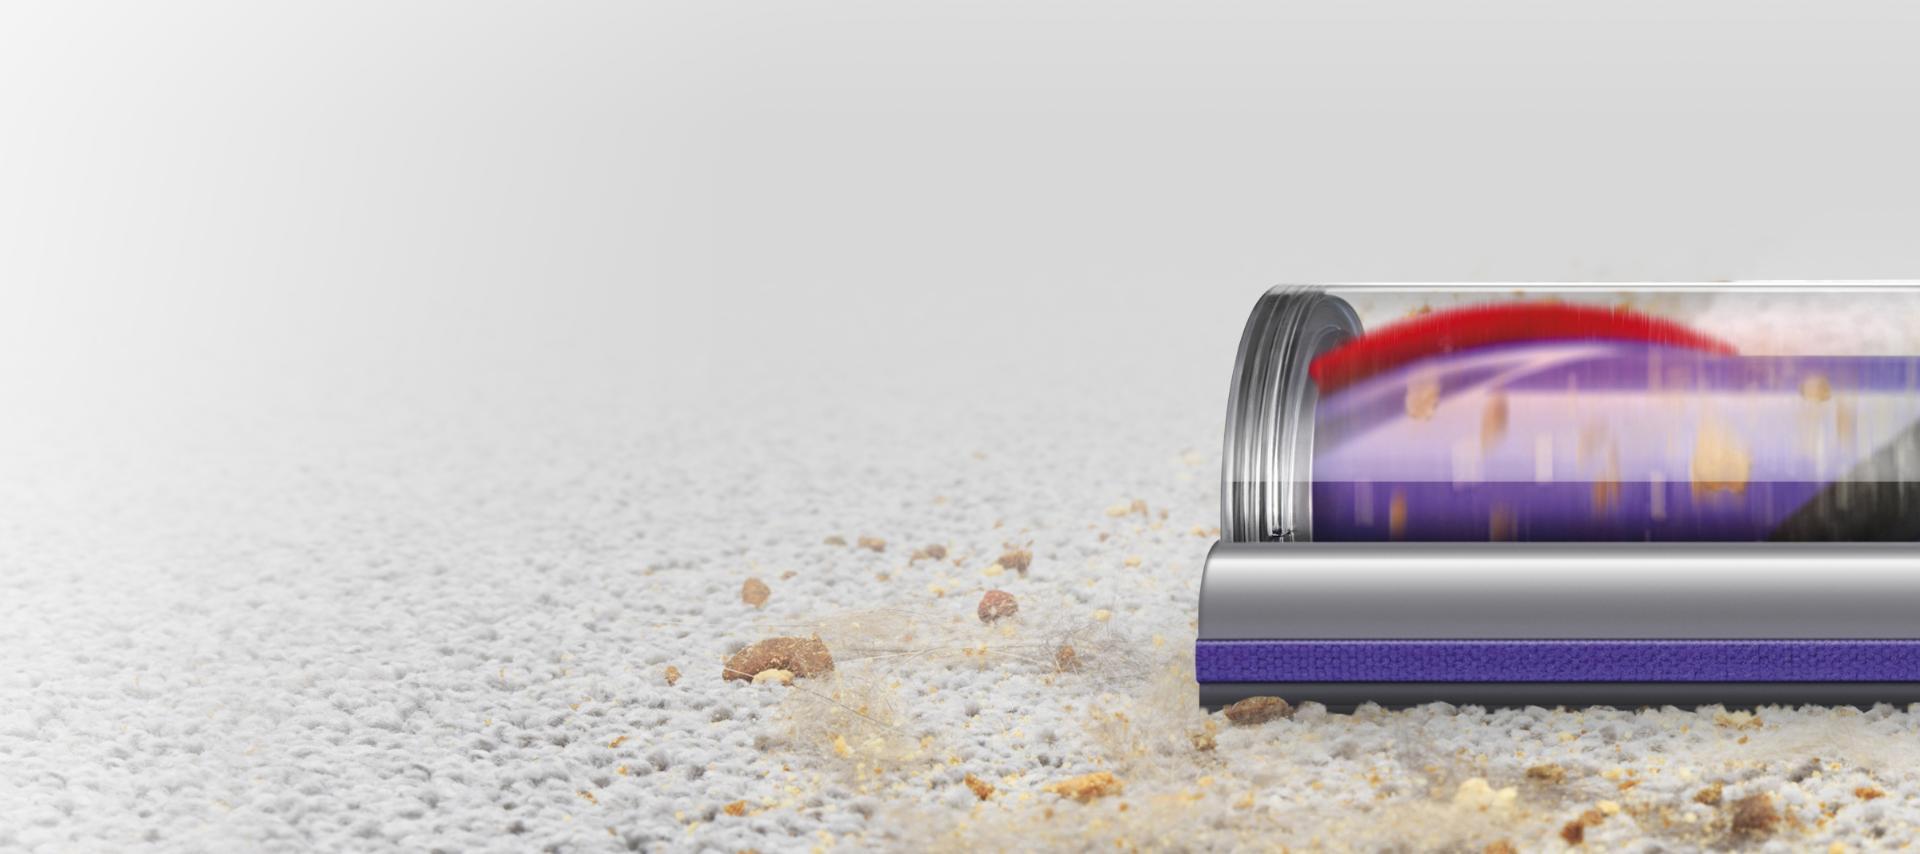 Torque drive motorhead attachment cleaning hard floor then carpet.